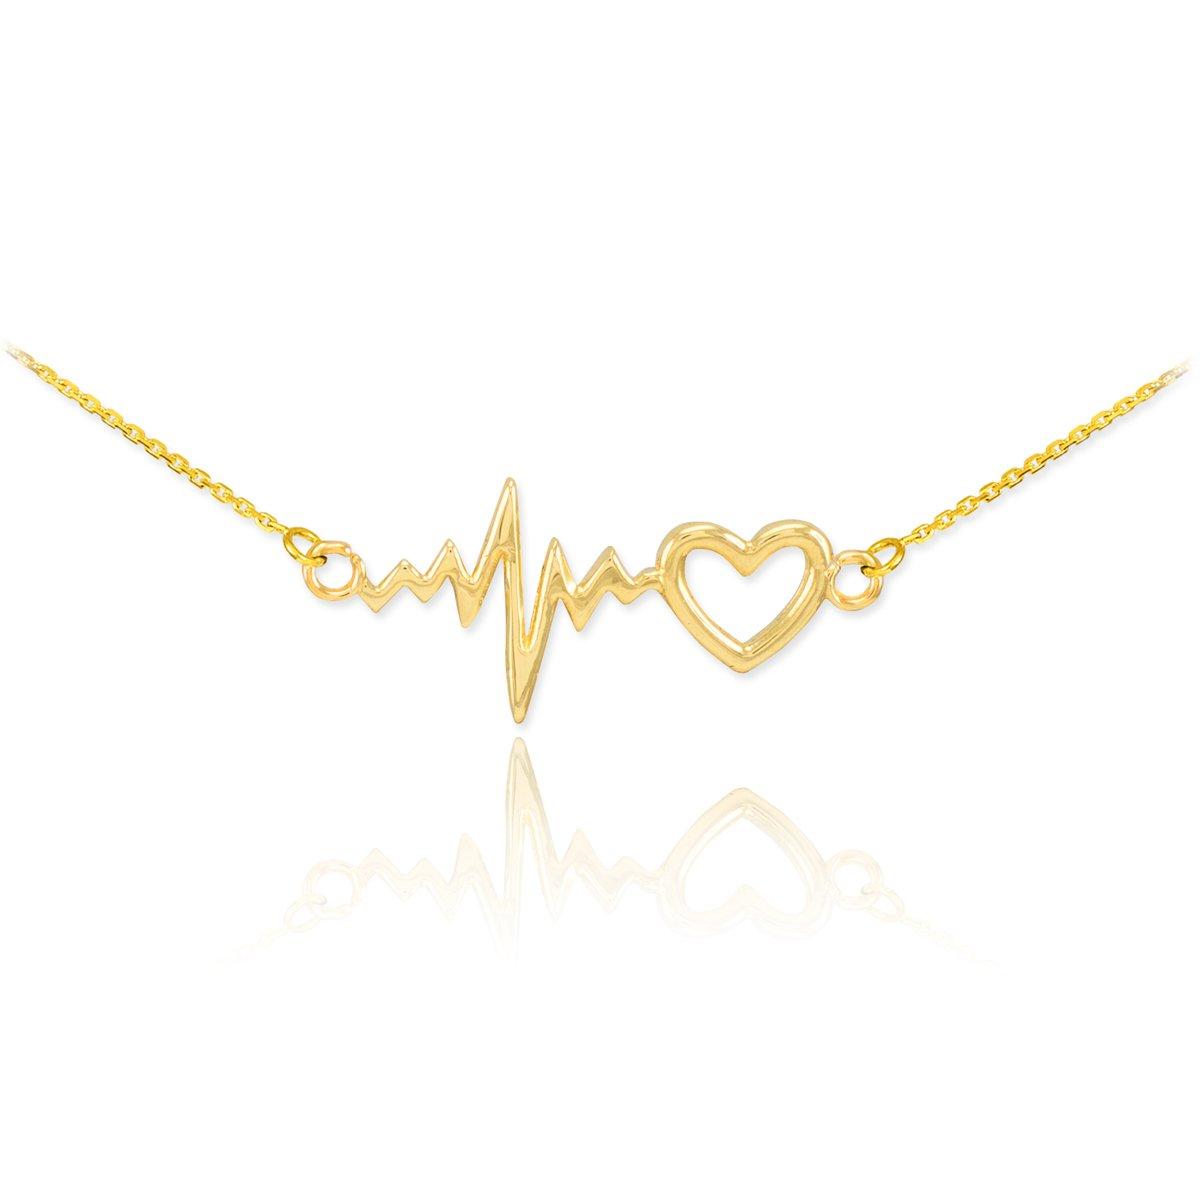 14k Yellow Gold Lifeline Pulse Heartbeat Charm Open Heart Pendant Necklace, 16''